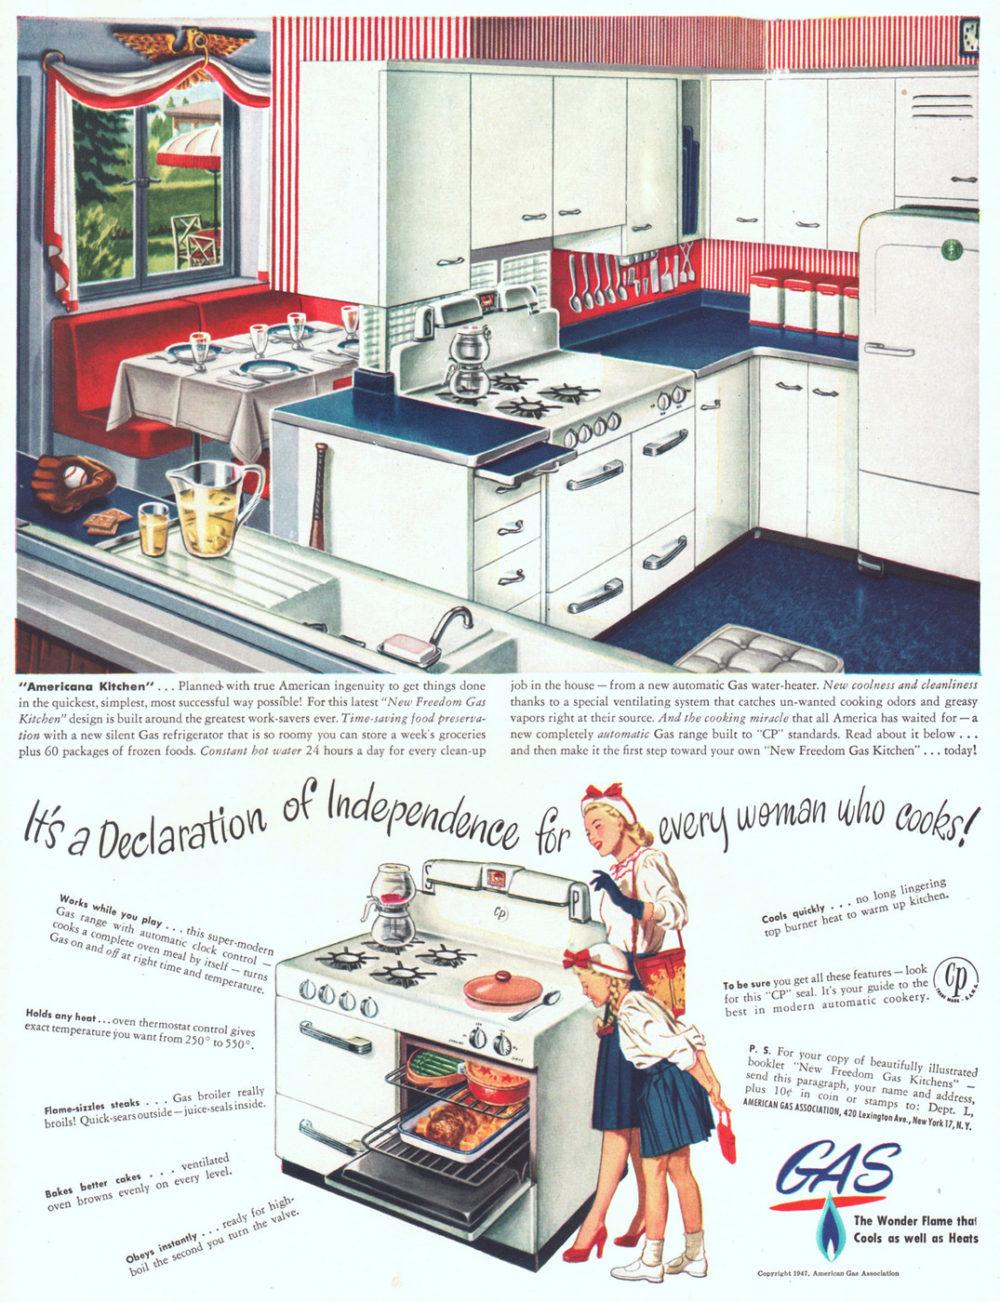 08 New Freedom Americana Kitchen